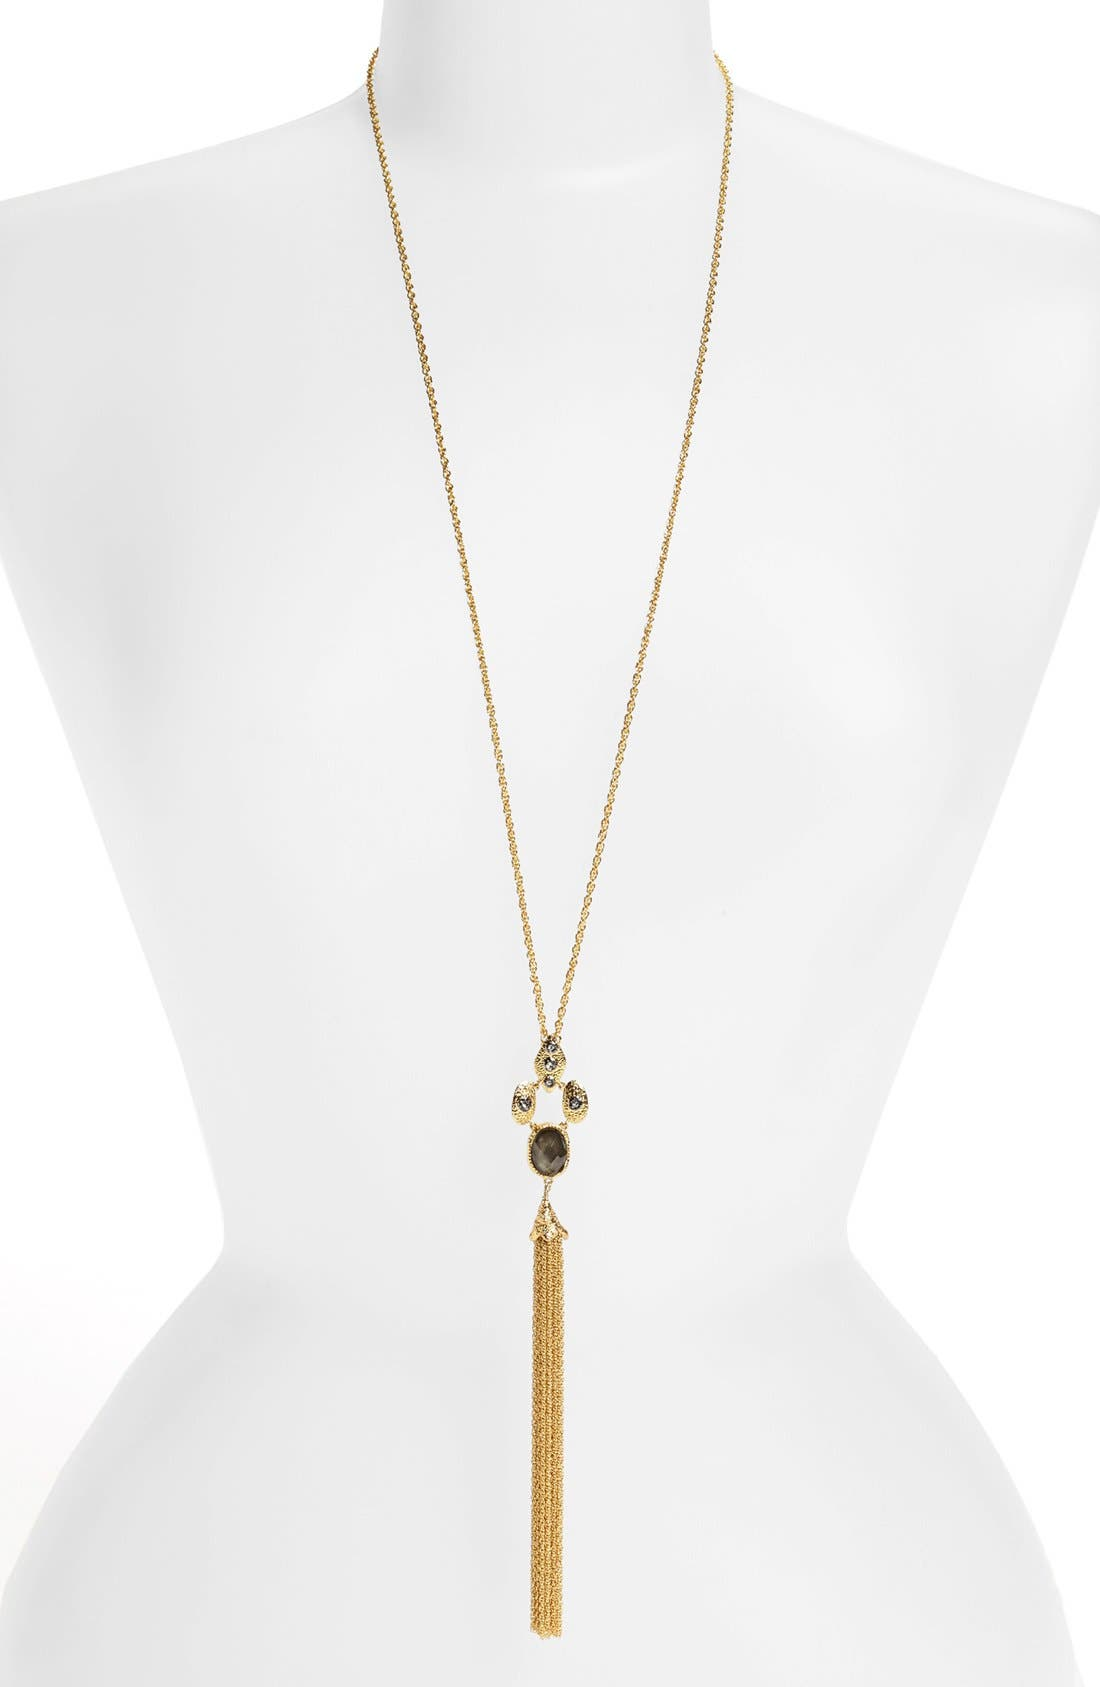 Main Image - Alexis Bittar 'Elements' Long Tassel Pendant Necklace